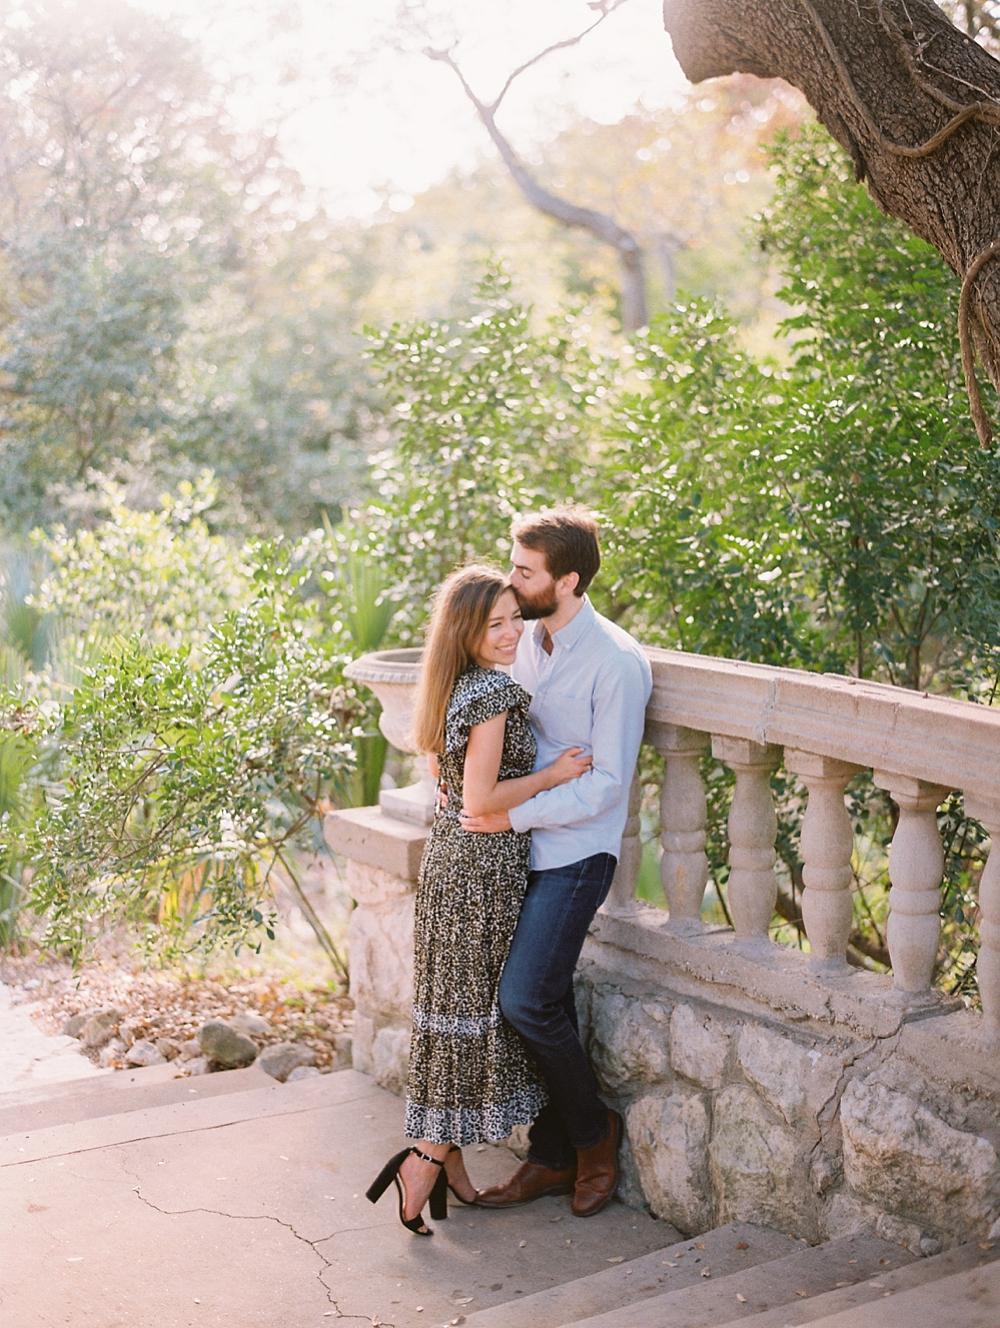 kristin-la-voie-photography-Austin-Wedding-Photographer-laguna-gloria-commodore-perry-estate-engagement-105